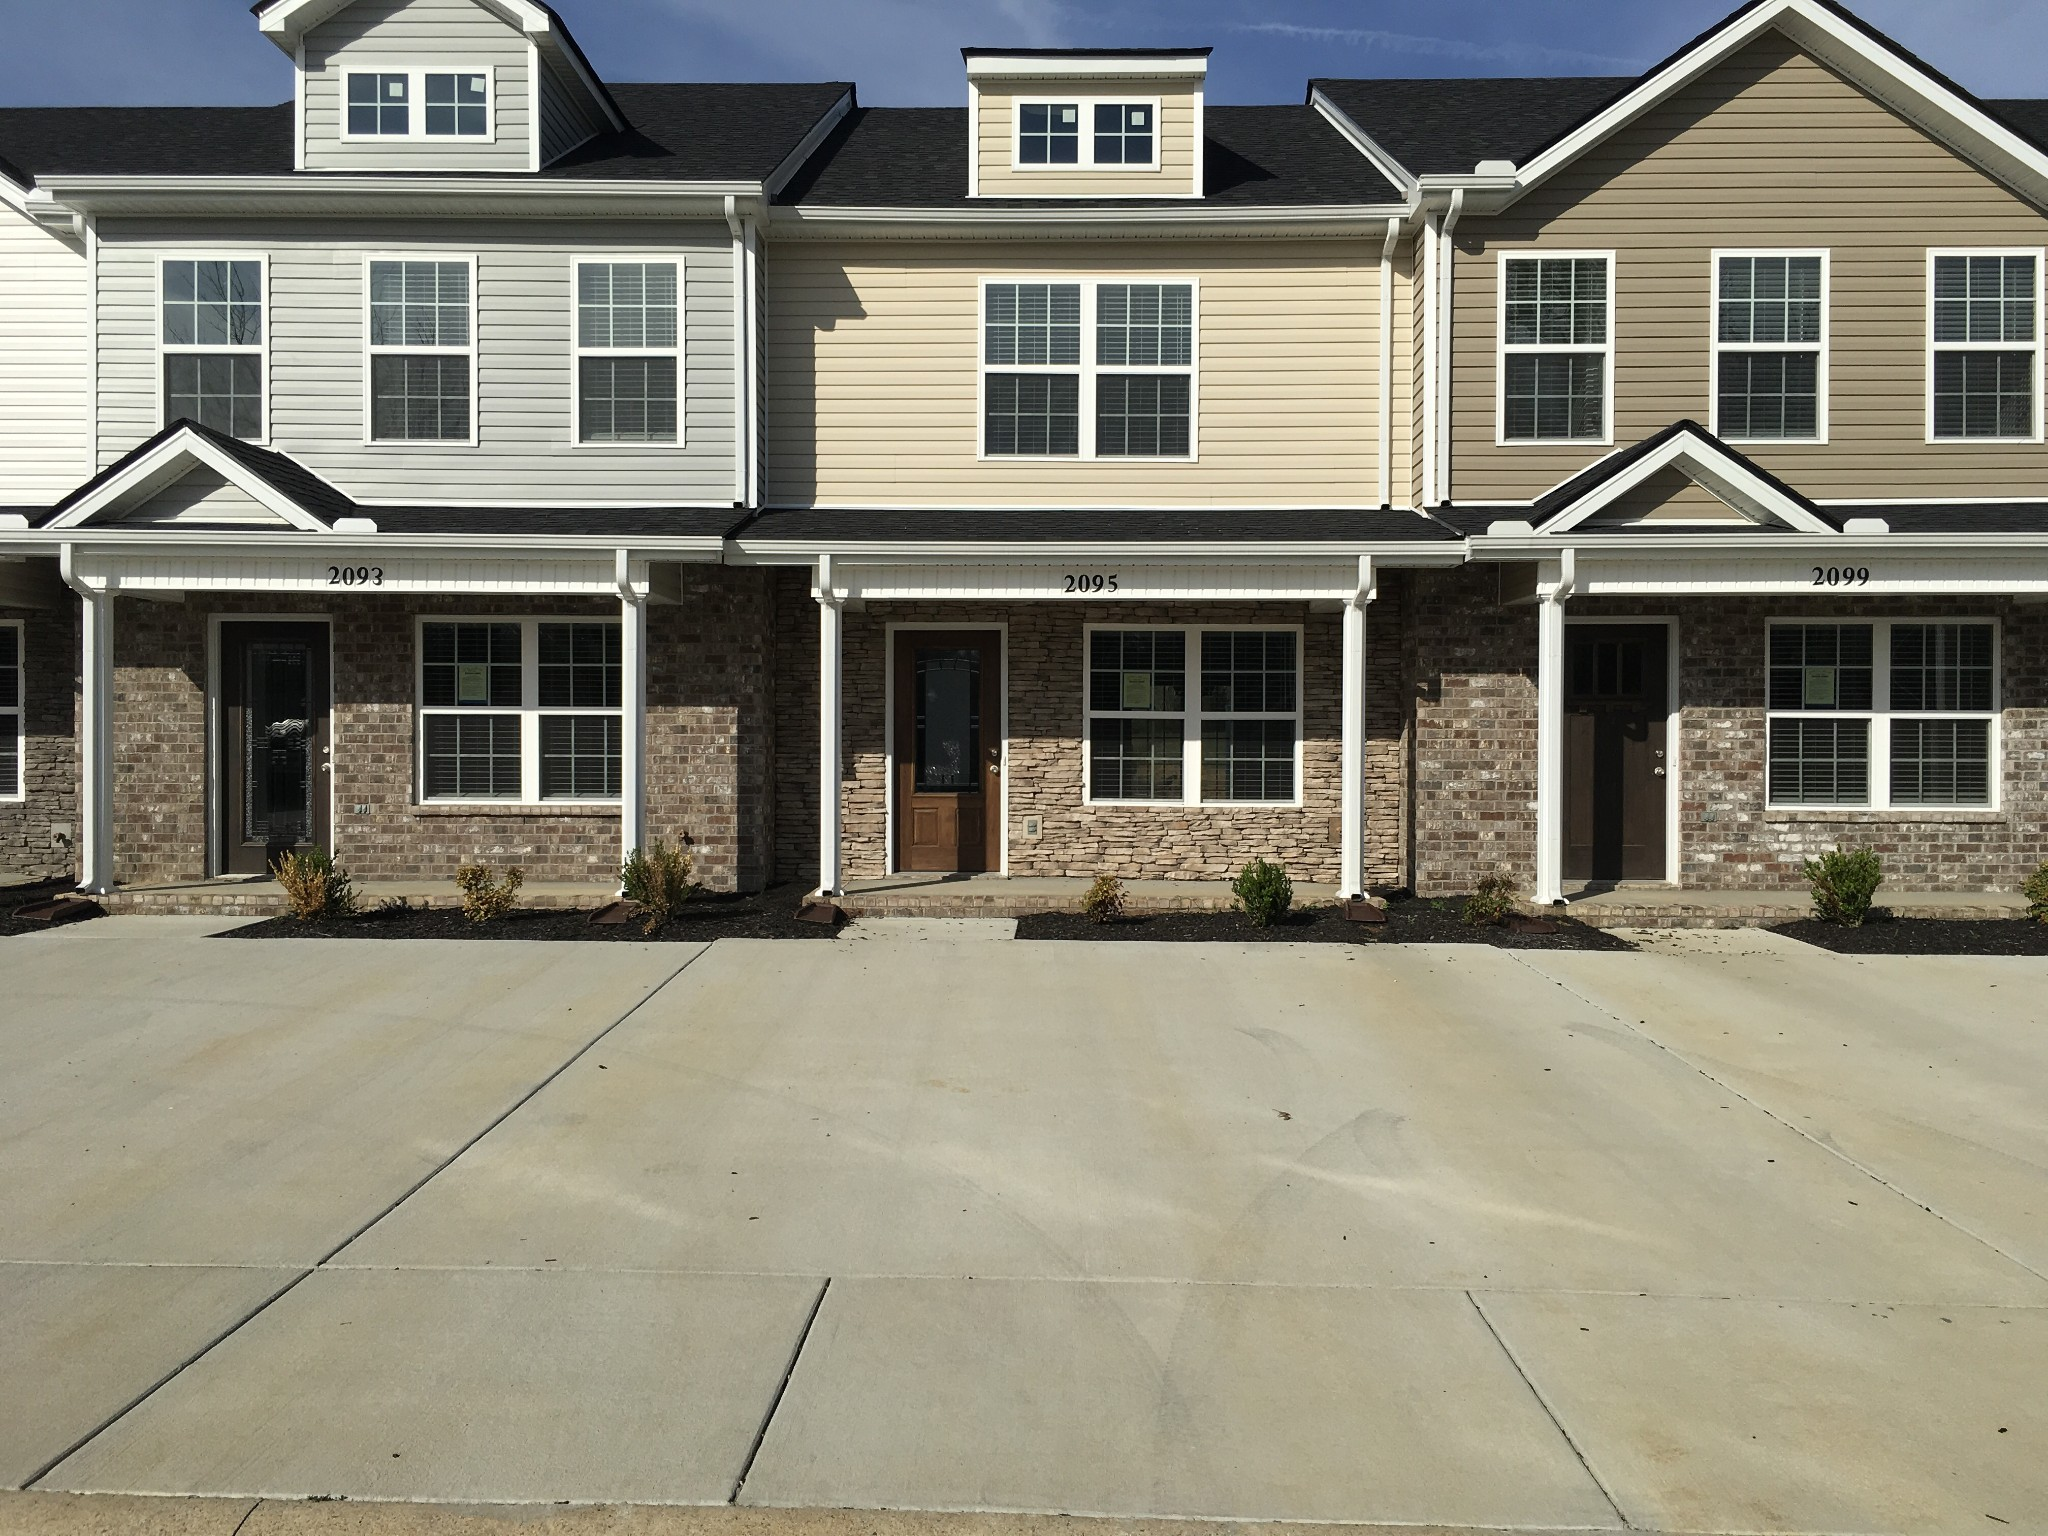 19 Unit 19 Downstream, Ashland City, TN 37015 - Ashland City, TN real estate listing